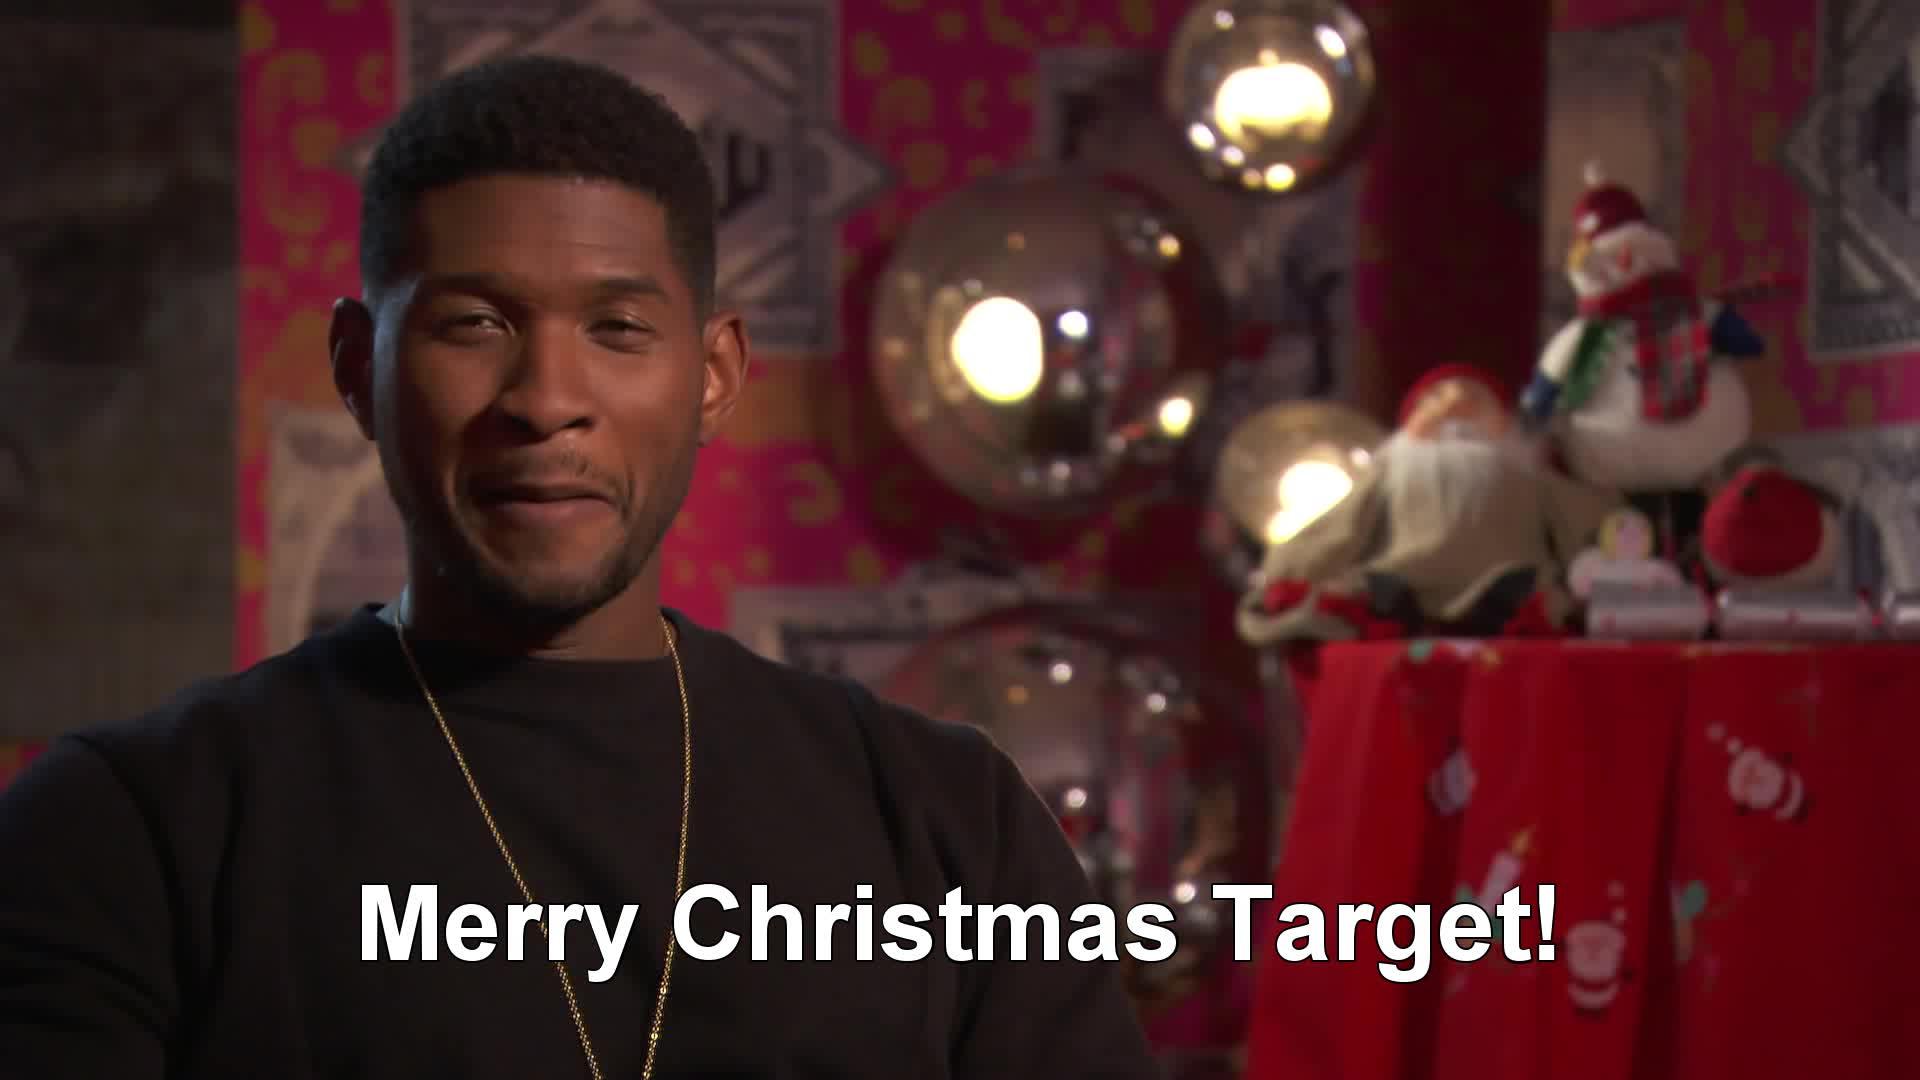 dance central, merry christmas, usher, Merry Christmas from Usher and Dance Central 3 GIFs